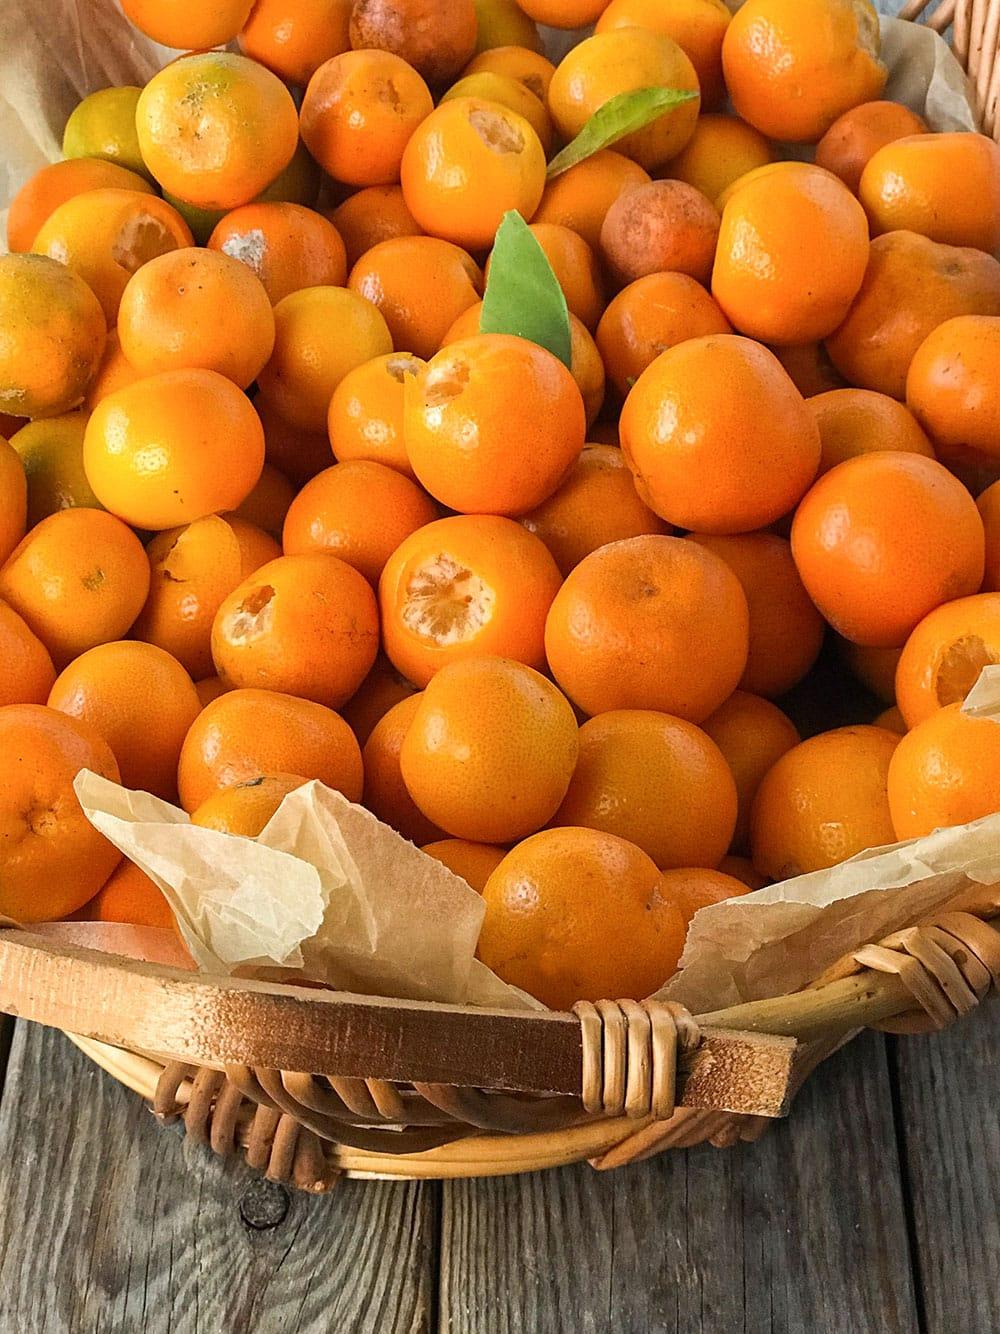 Meiwa kumquat for making marmalade in a basket